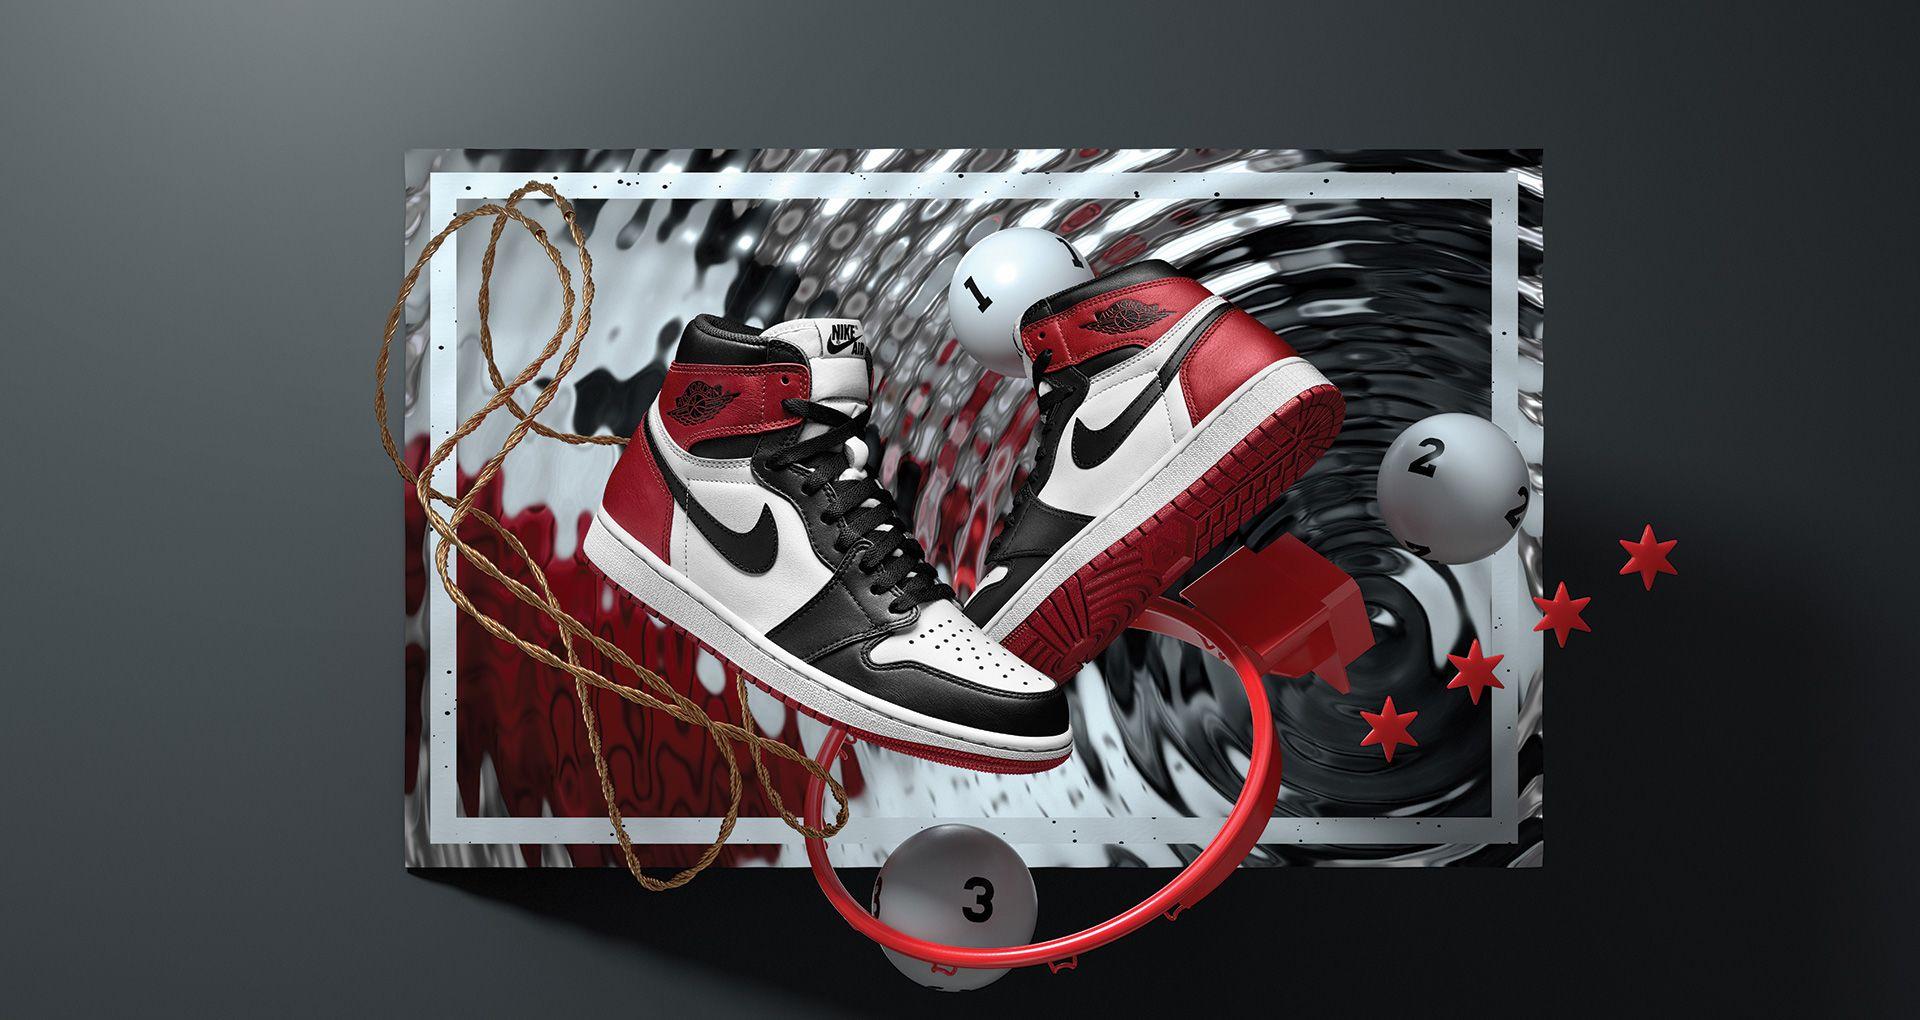 promo code 4cec7 1327f Air Jordan 1 Retro  Black Toe  Release Date. Nike+ SNKRS